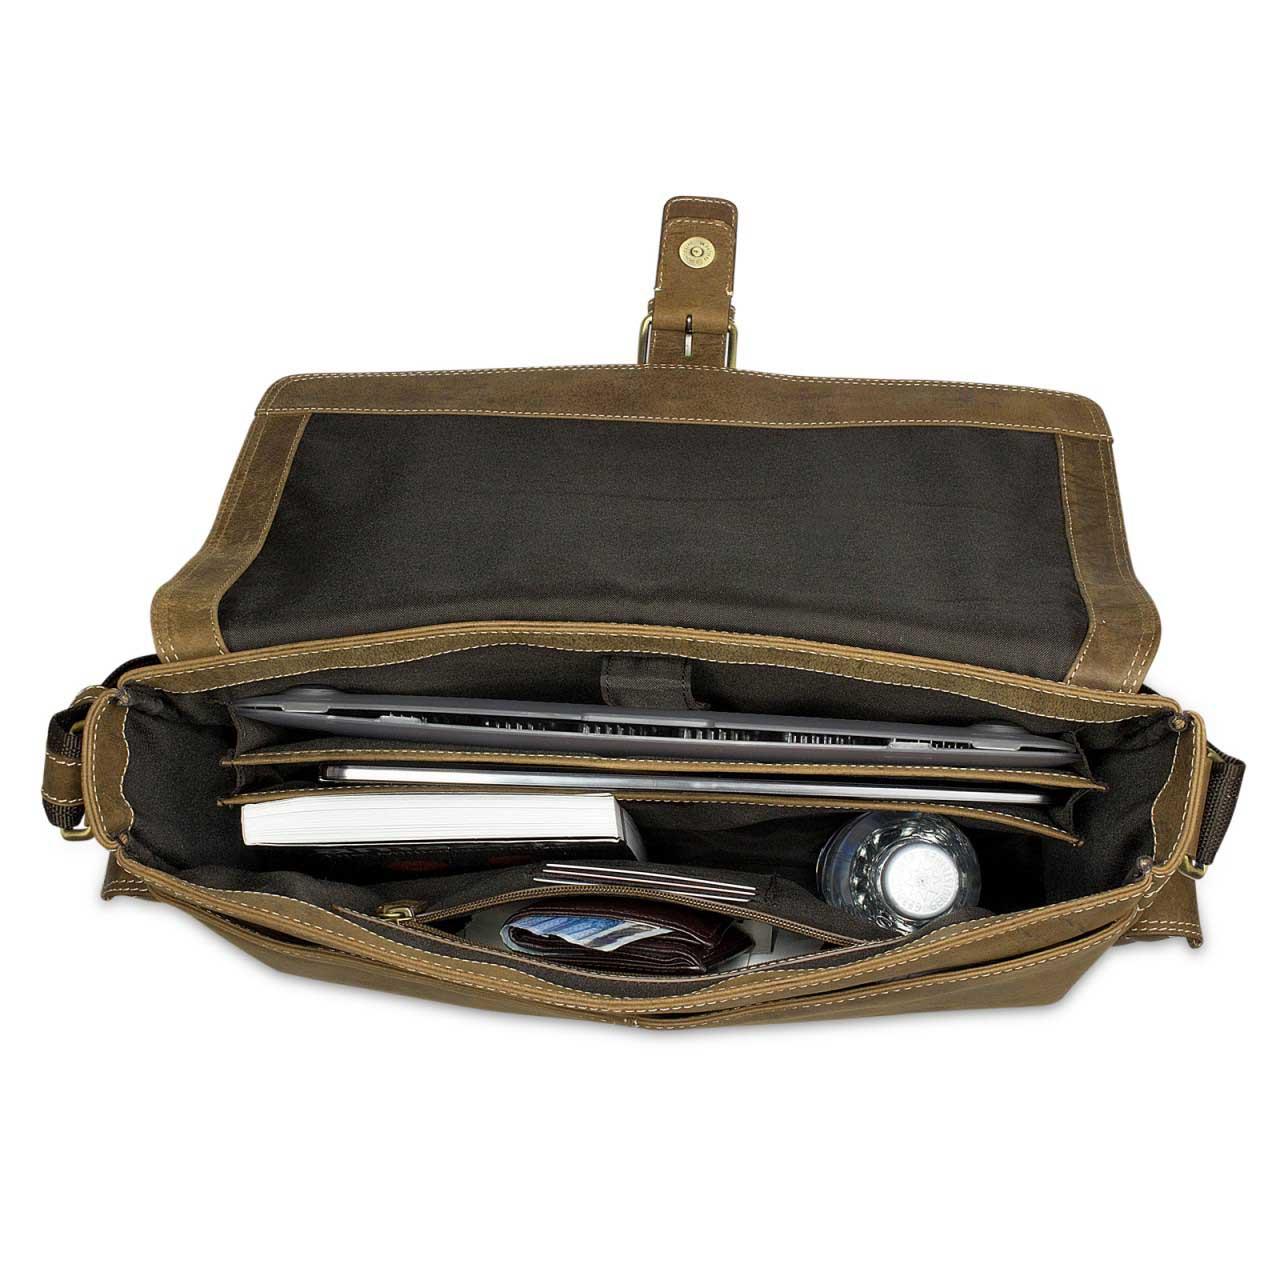 STILORD Ledertasche Umhängetasche 15.6 Zoll Laptoptasche aus echtem Büffel-Leder braun  - Bild 5